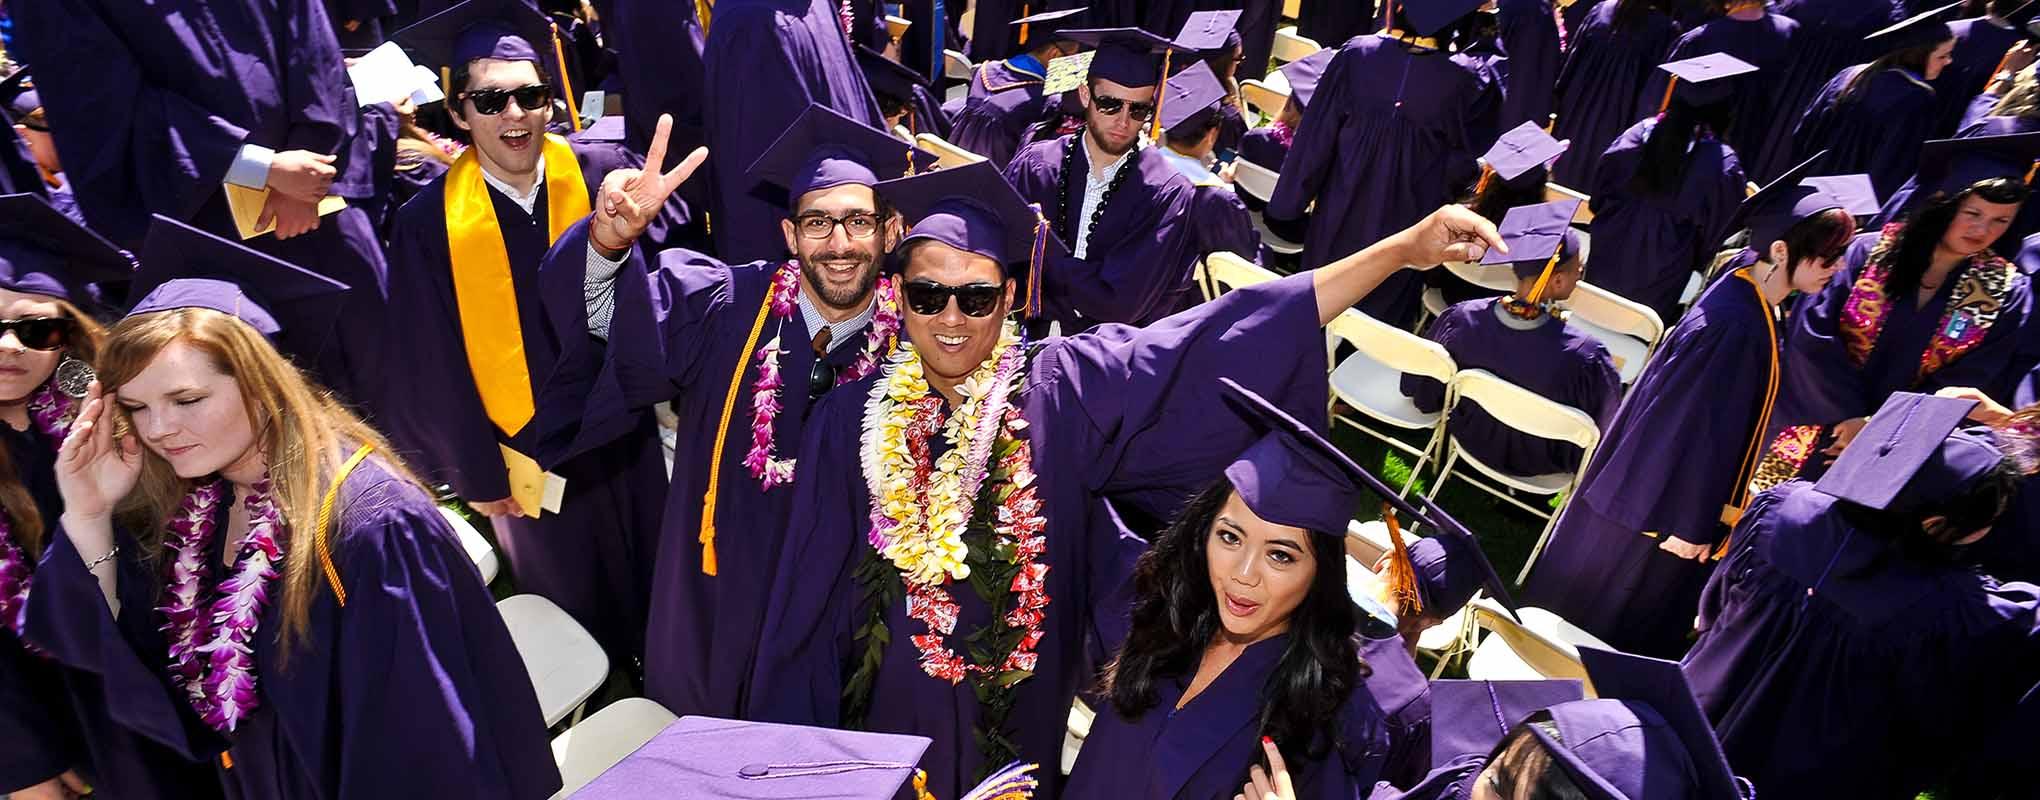 SFSU graduates